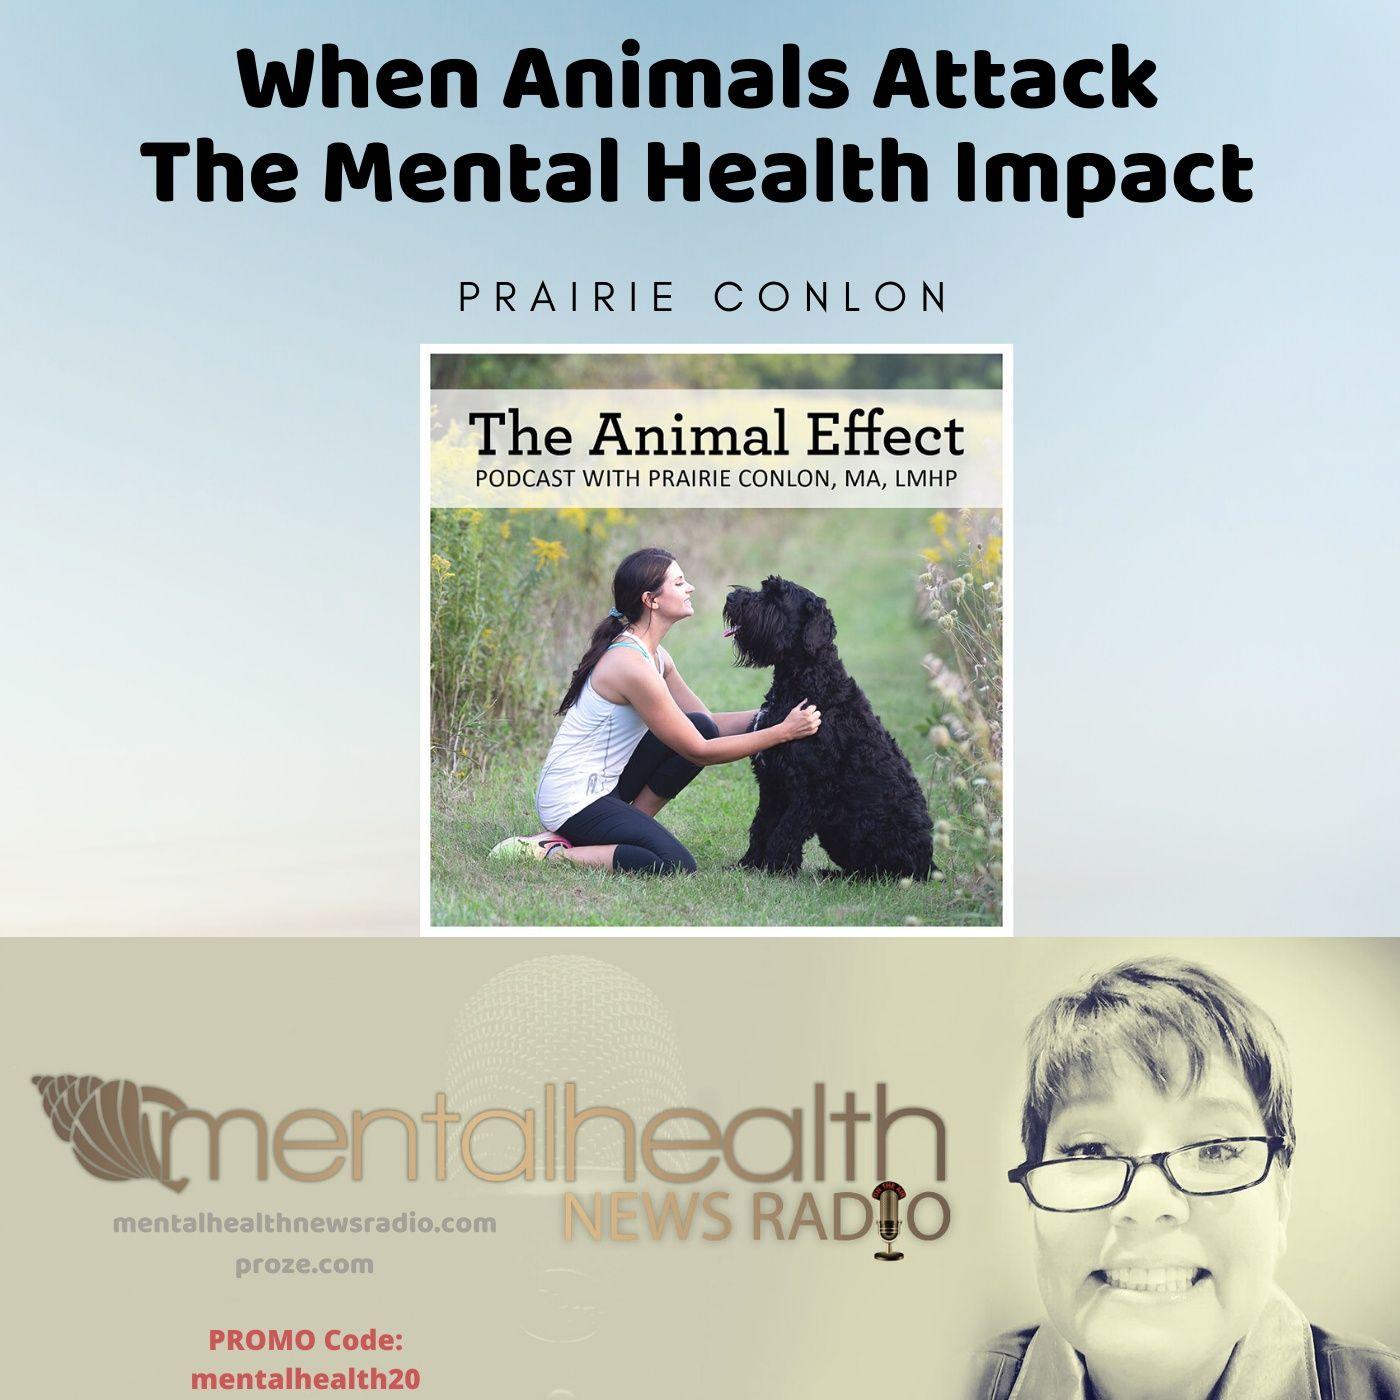 Mental Health News Radio - When Animals Attack: The Mental Health Impact